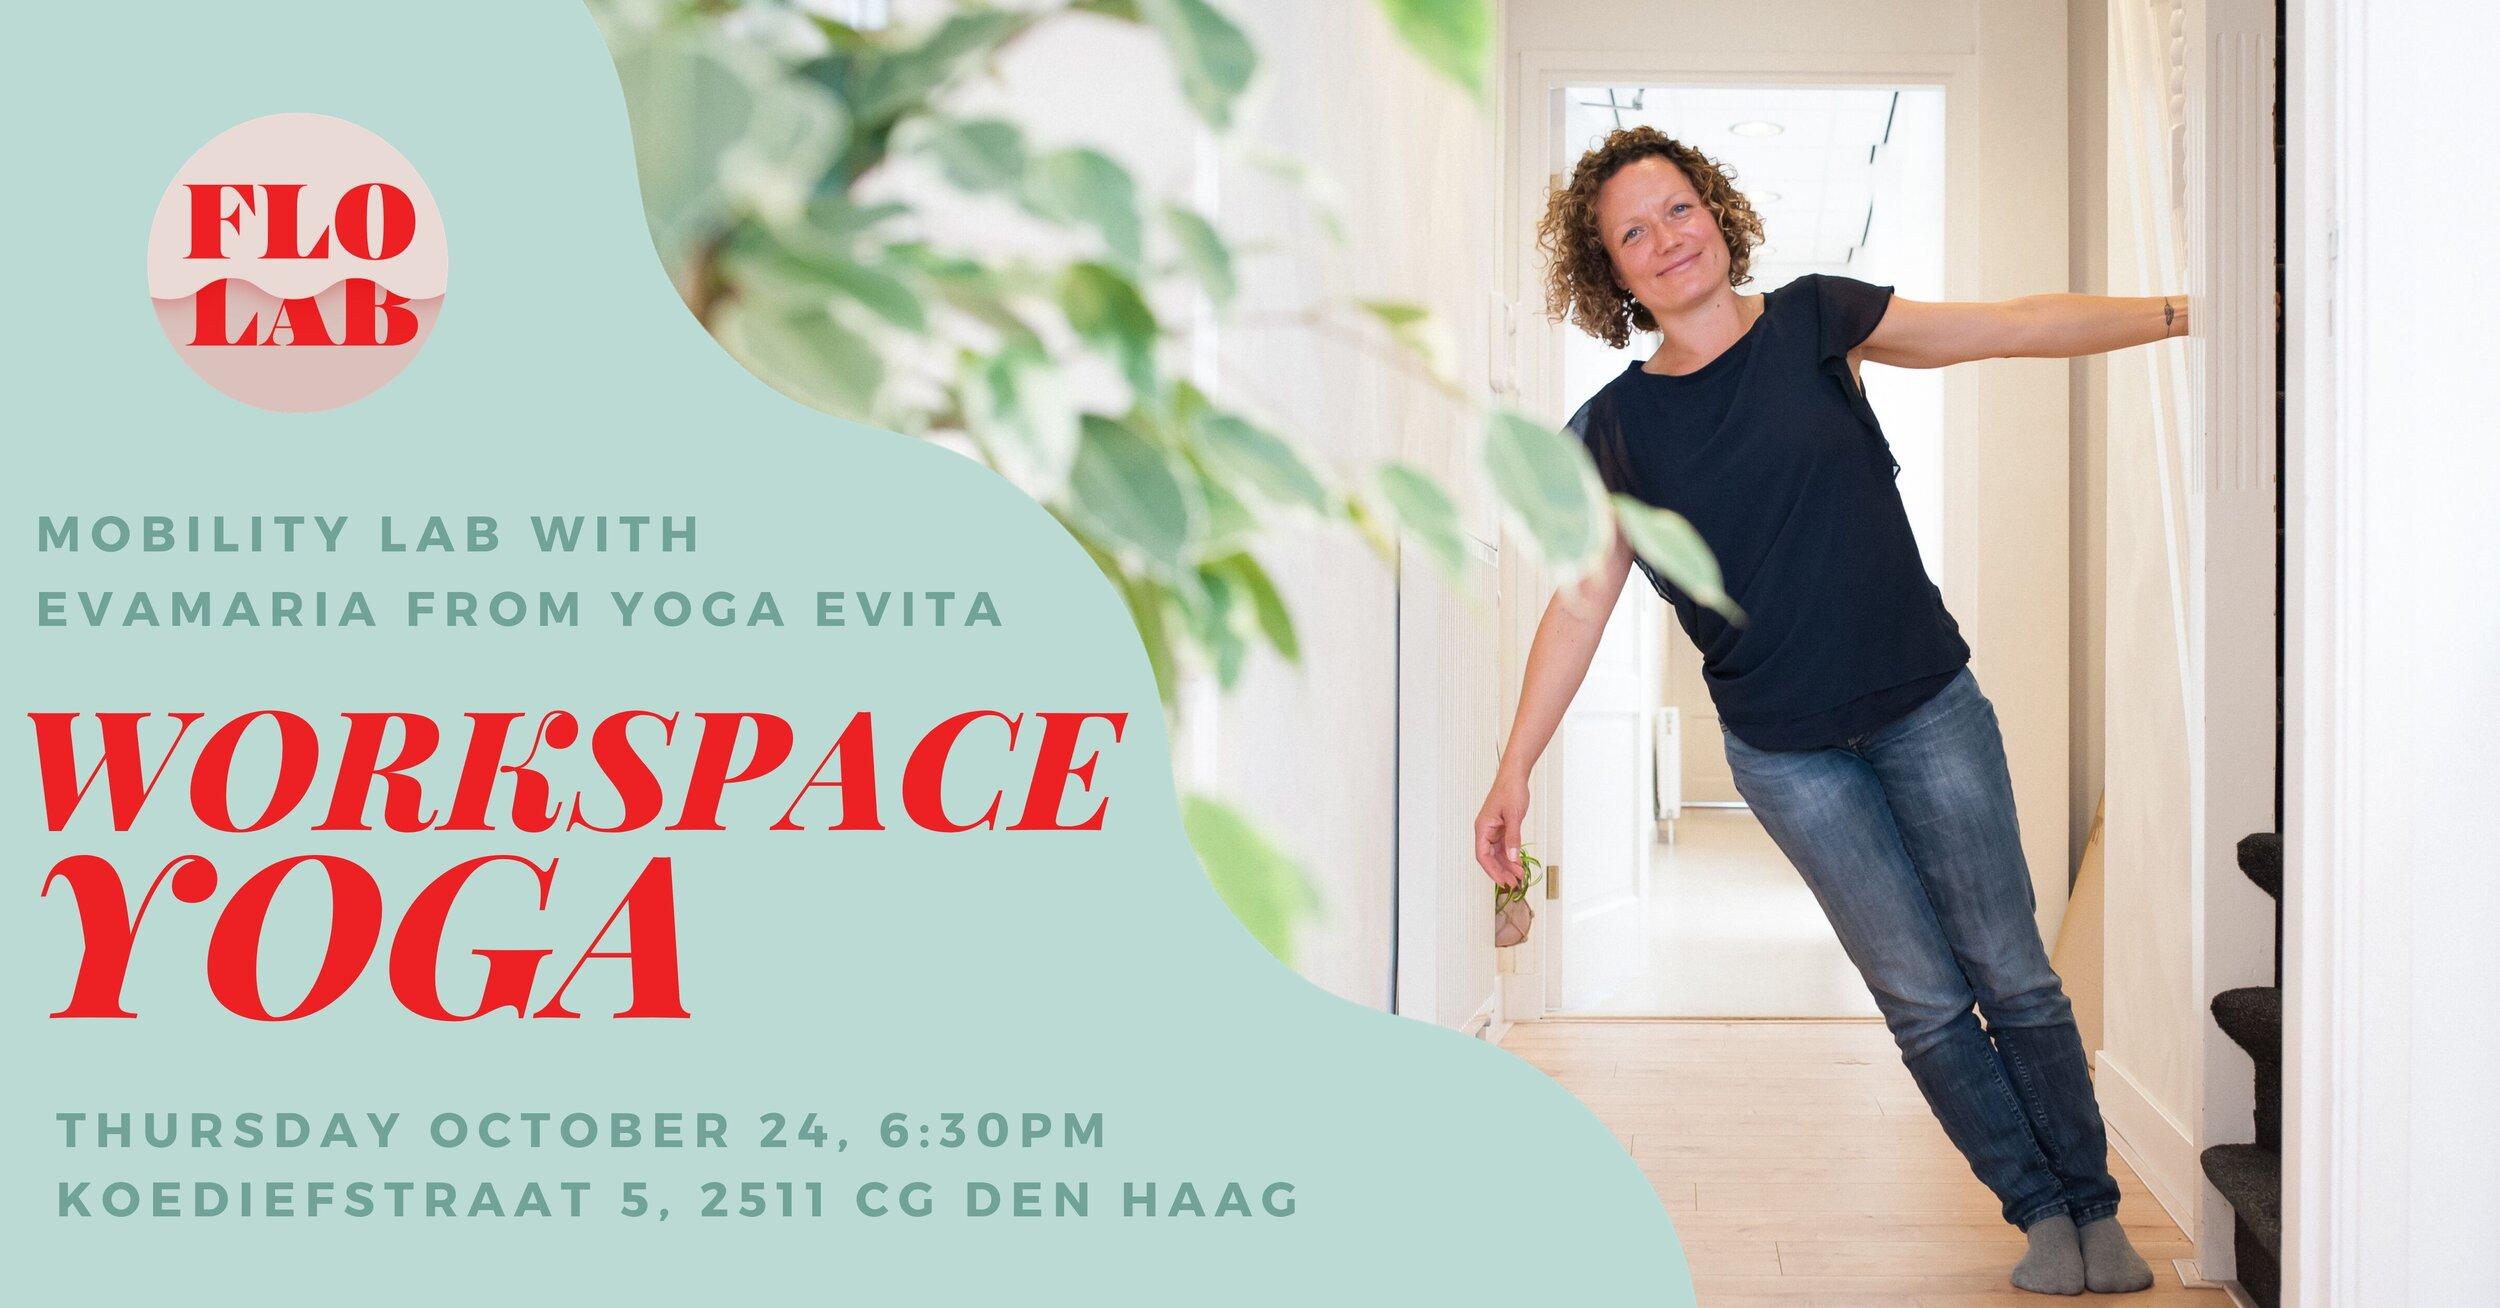 Workspace Yoga with Evamaria